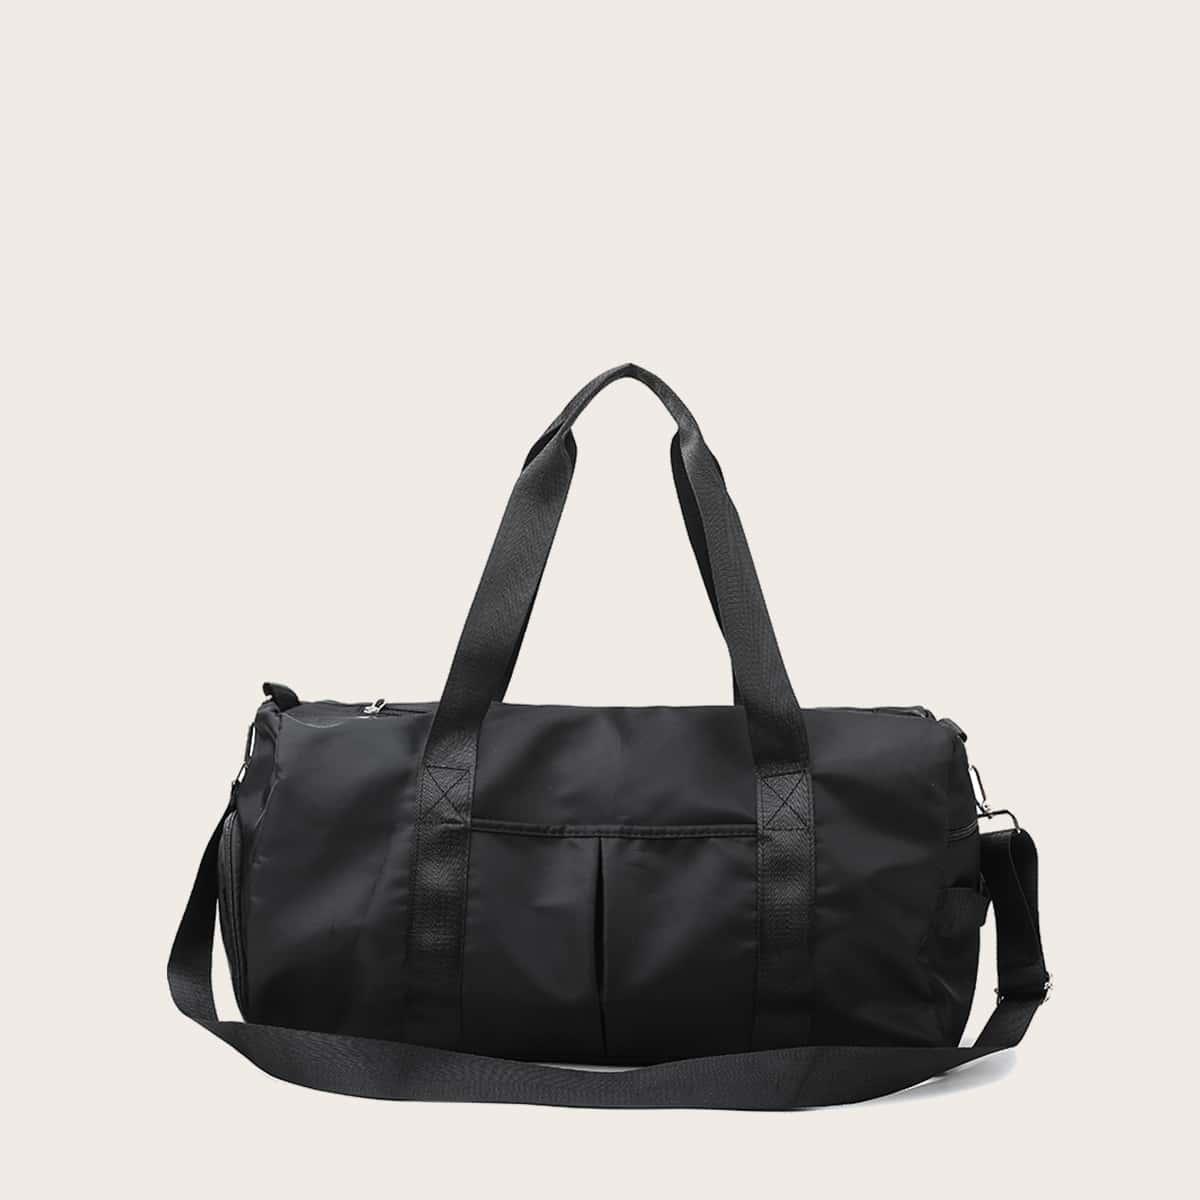 Минималистская сумка-бочонок